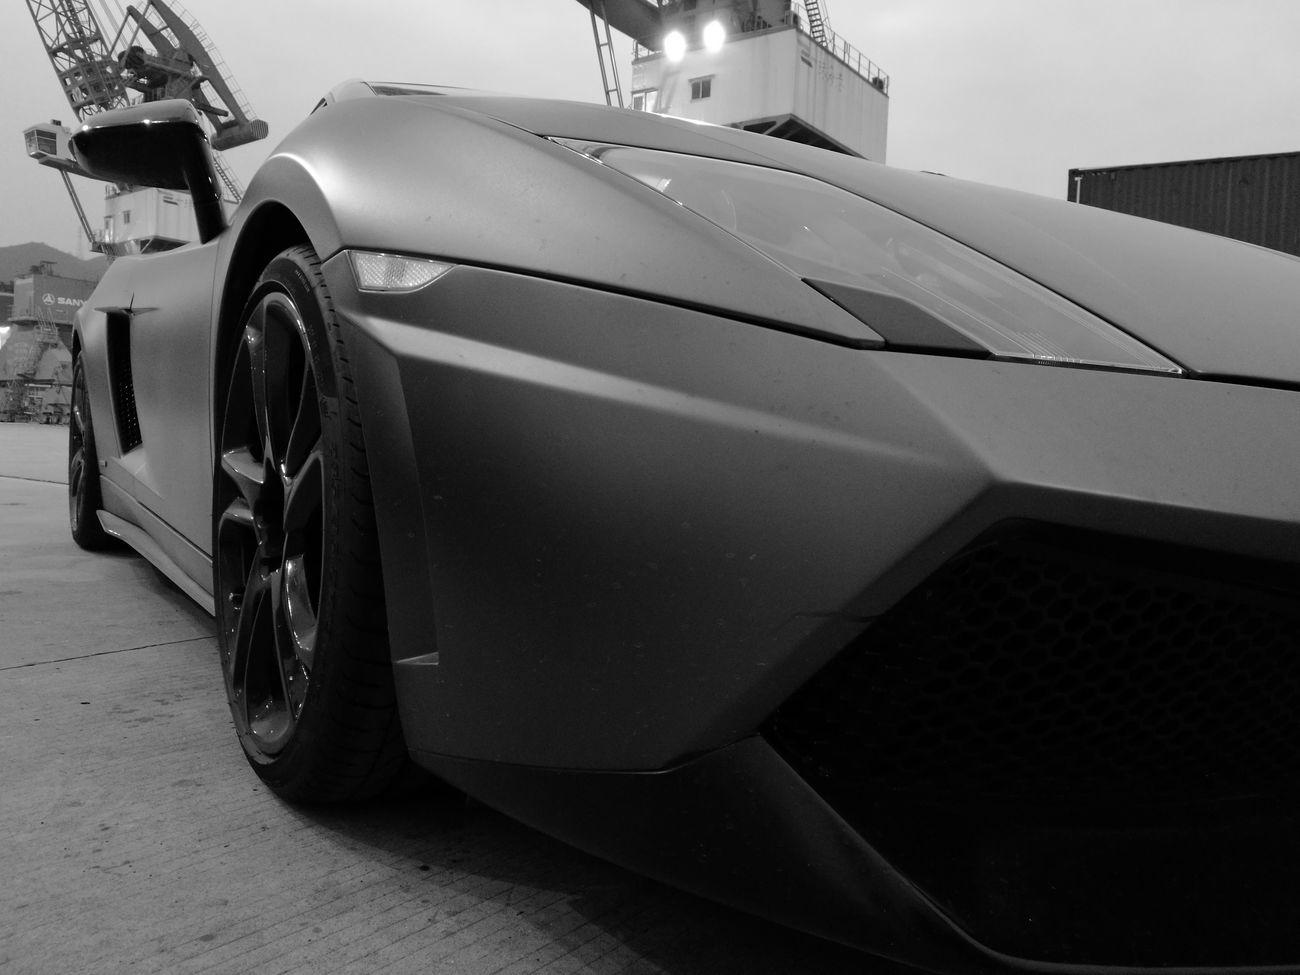 Lambo on TV show set Speed Car Racecar Zhuhai Tv Show